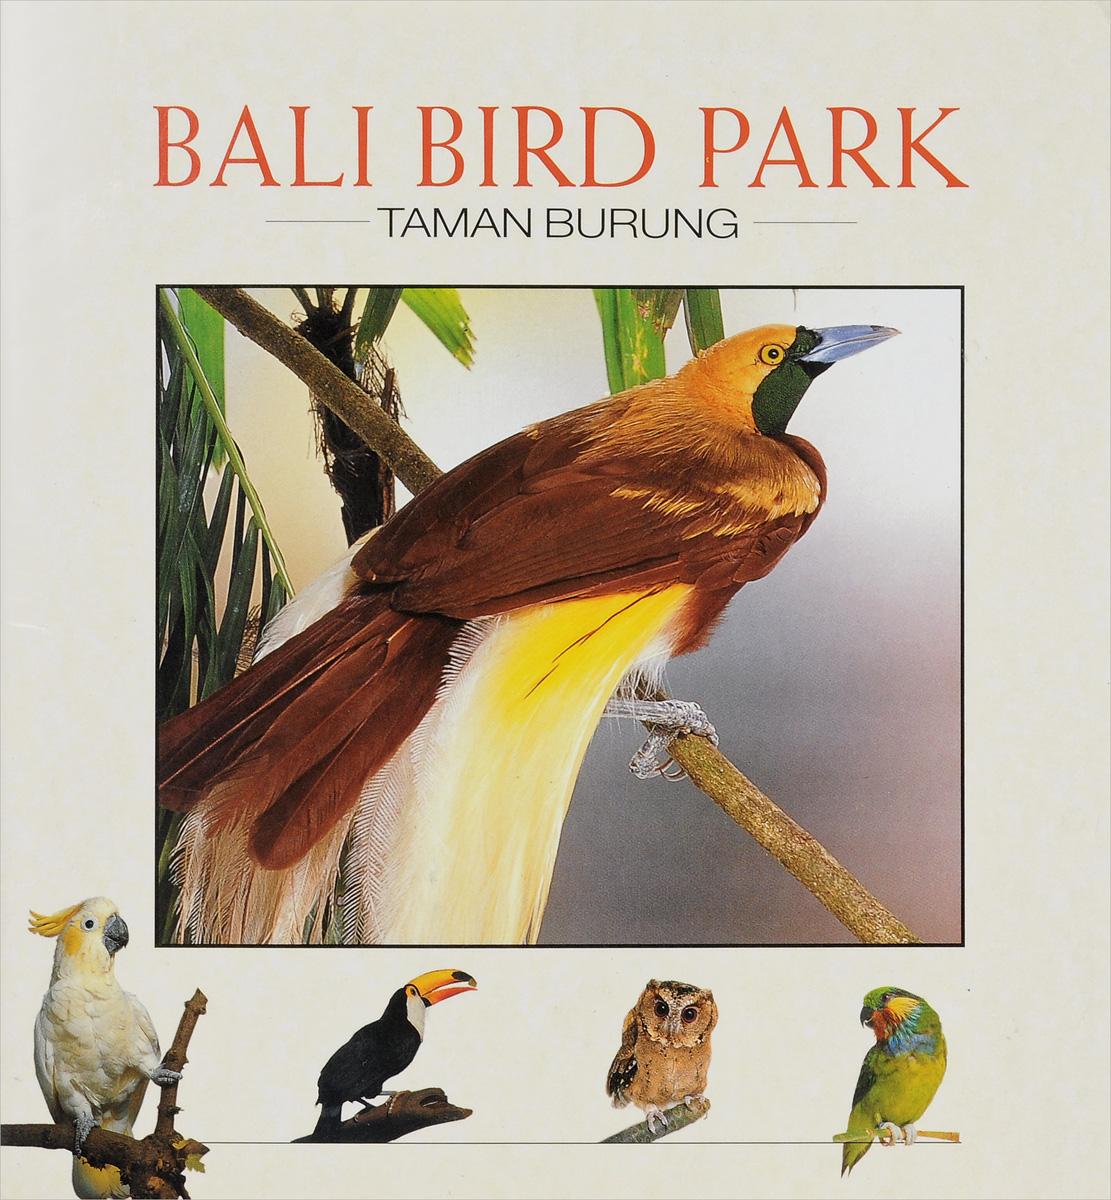 Bali bird park bali bird park